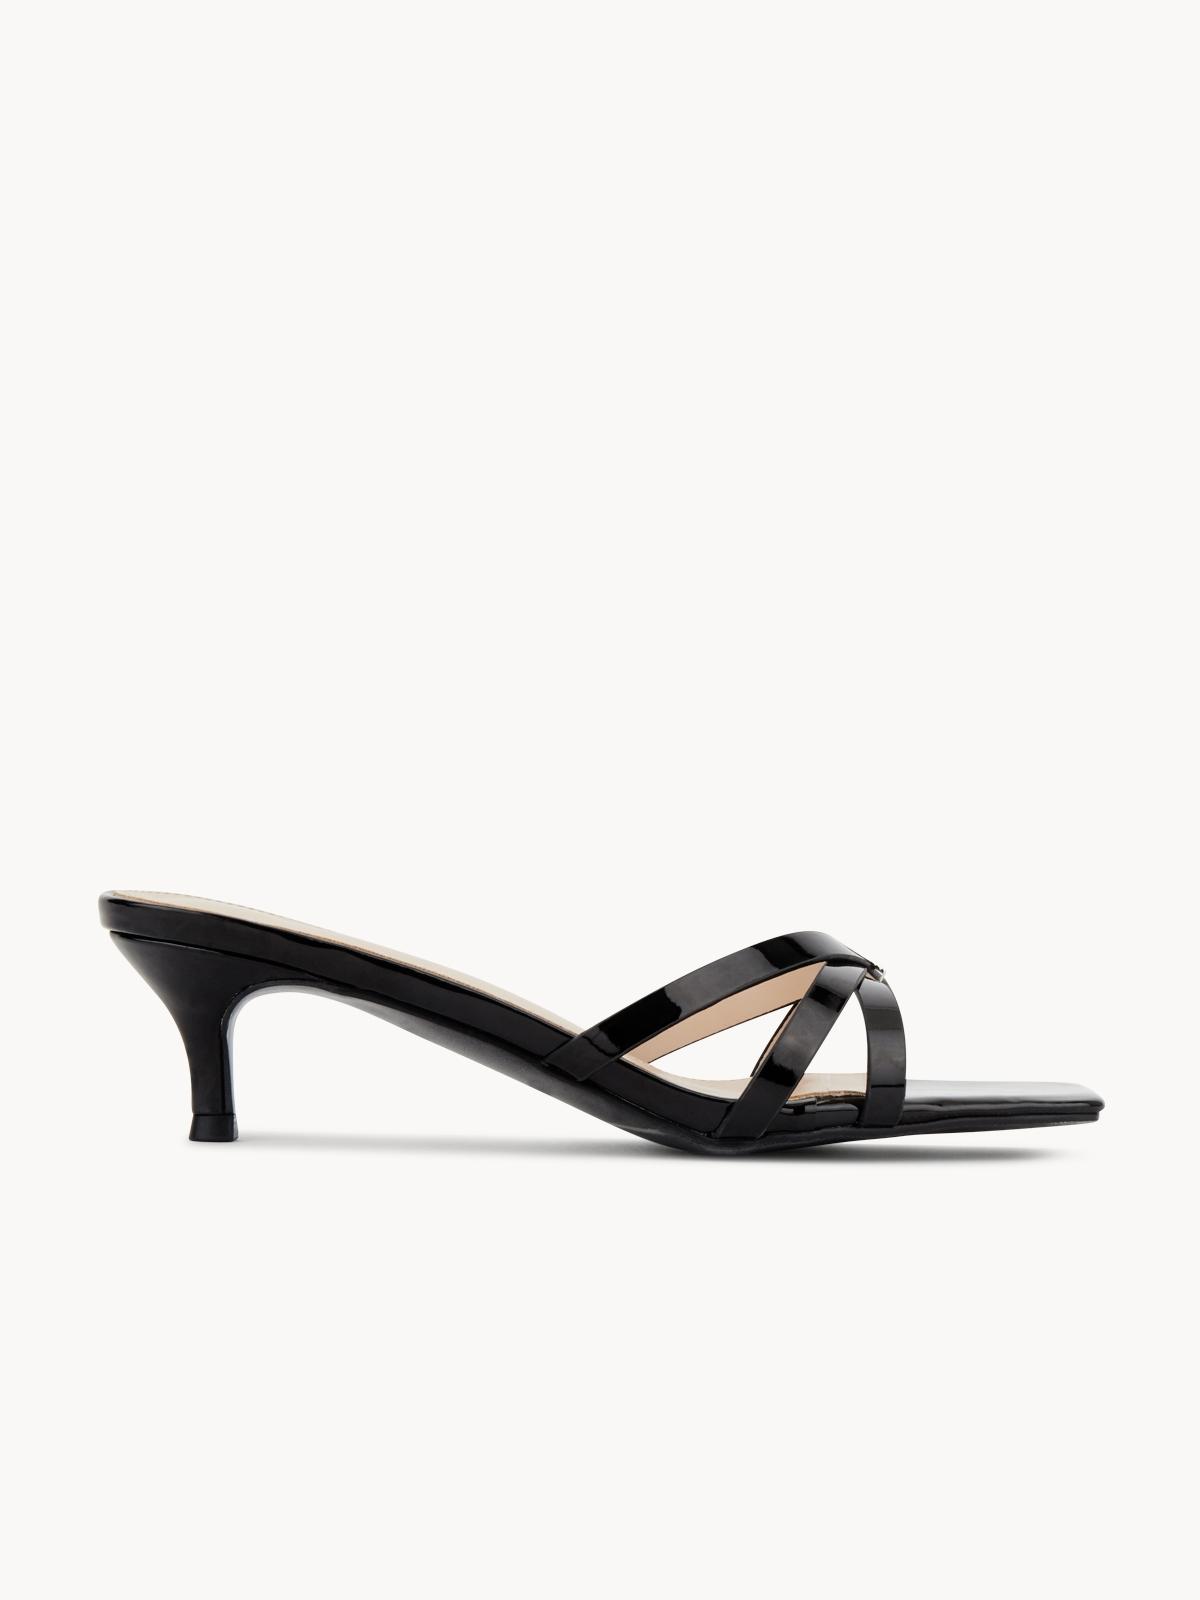 Starkela Tied Strips Sandal Heels Black